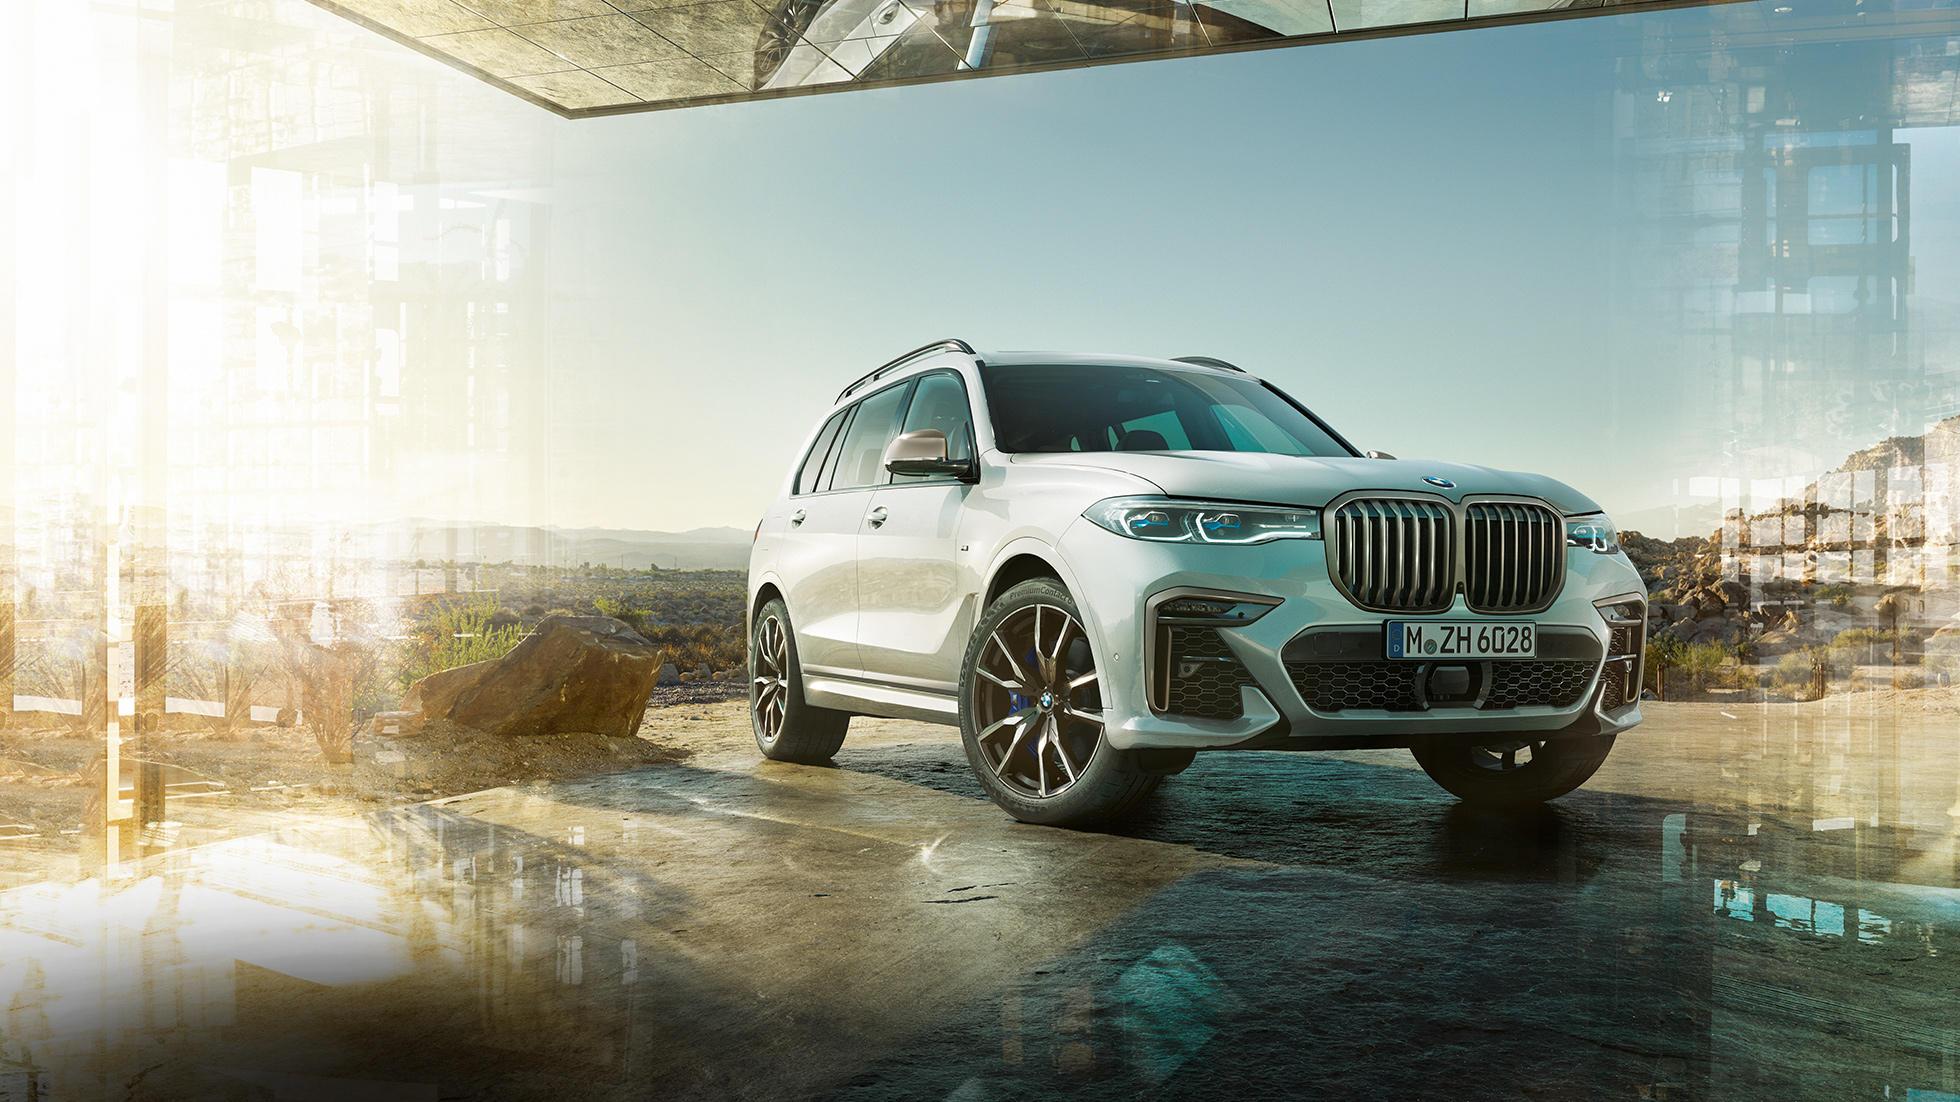 S-a lansat si in Romania. Cat costa primul BMW X7 din istorie?